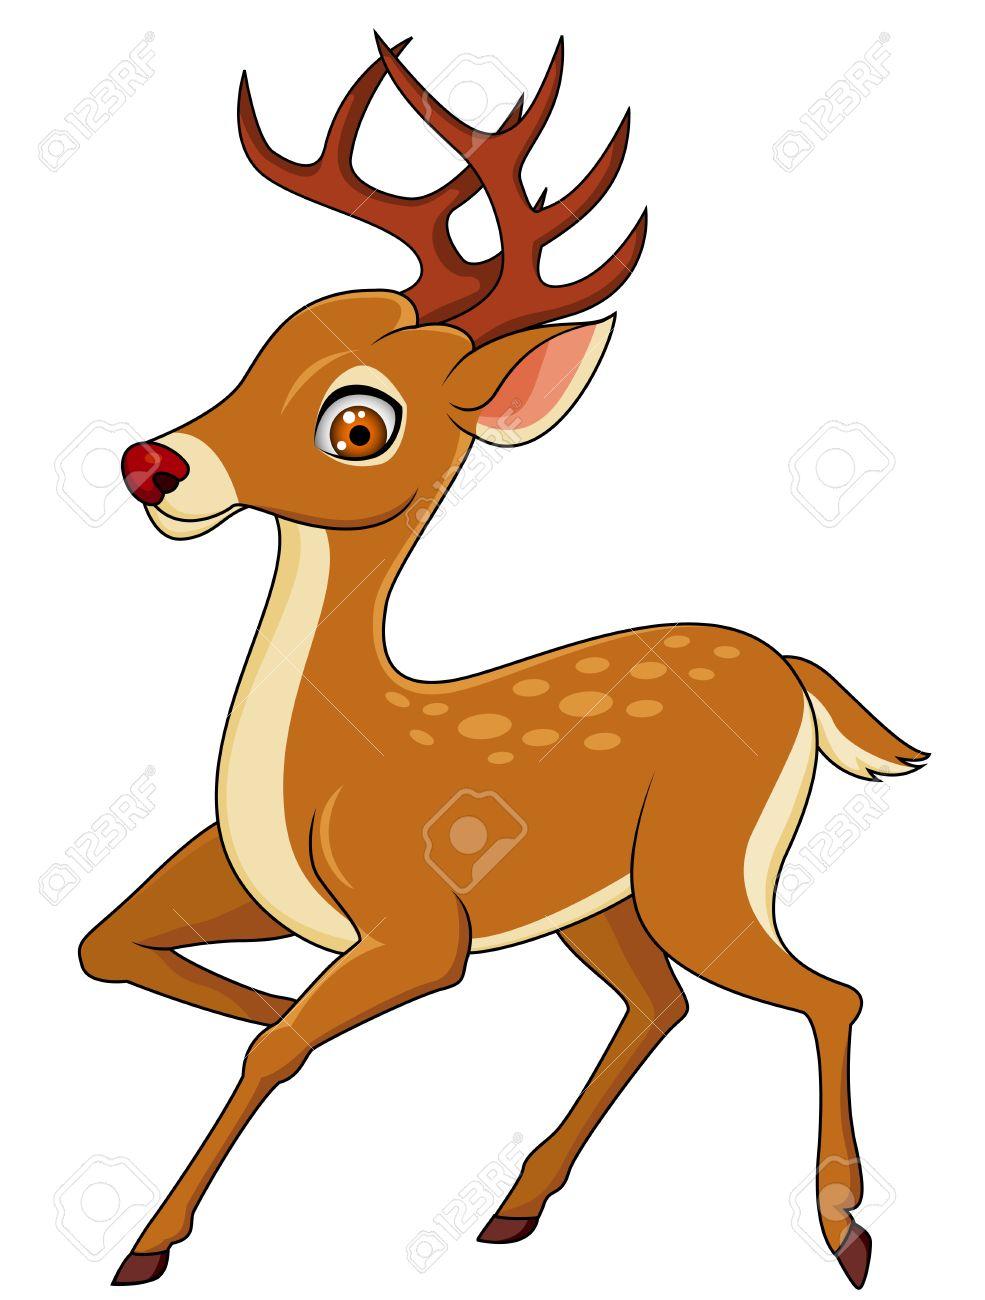 Deer cartoon - 13494851